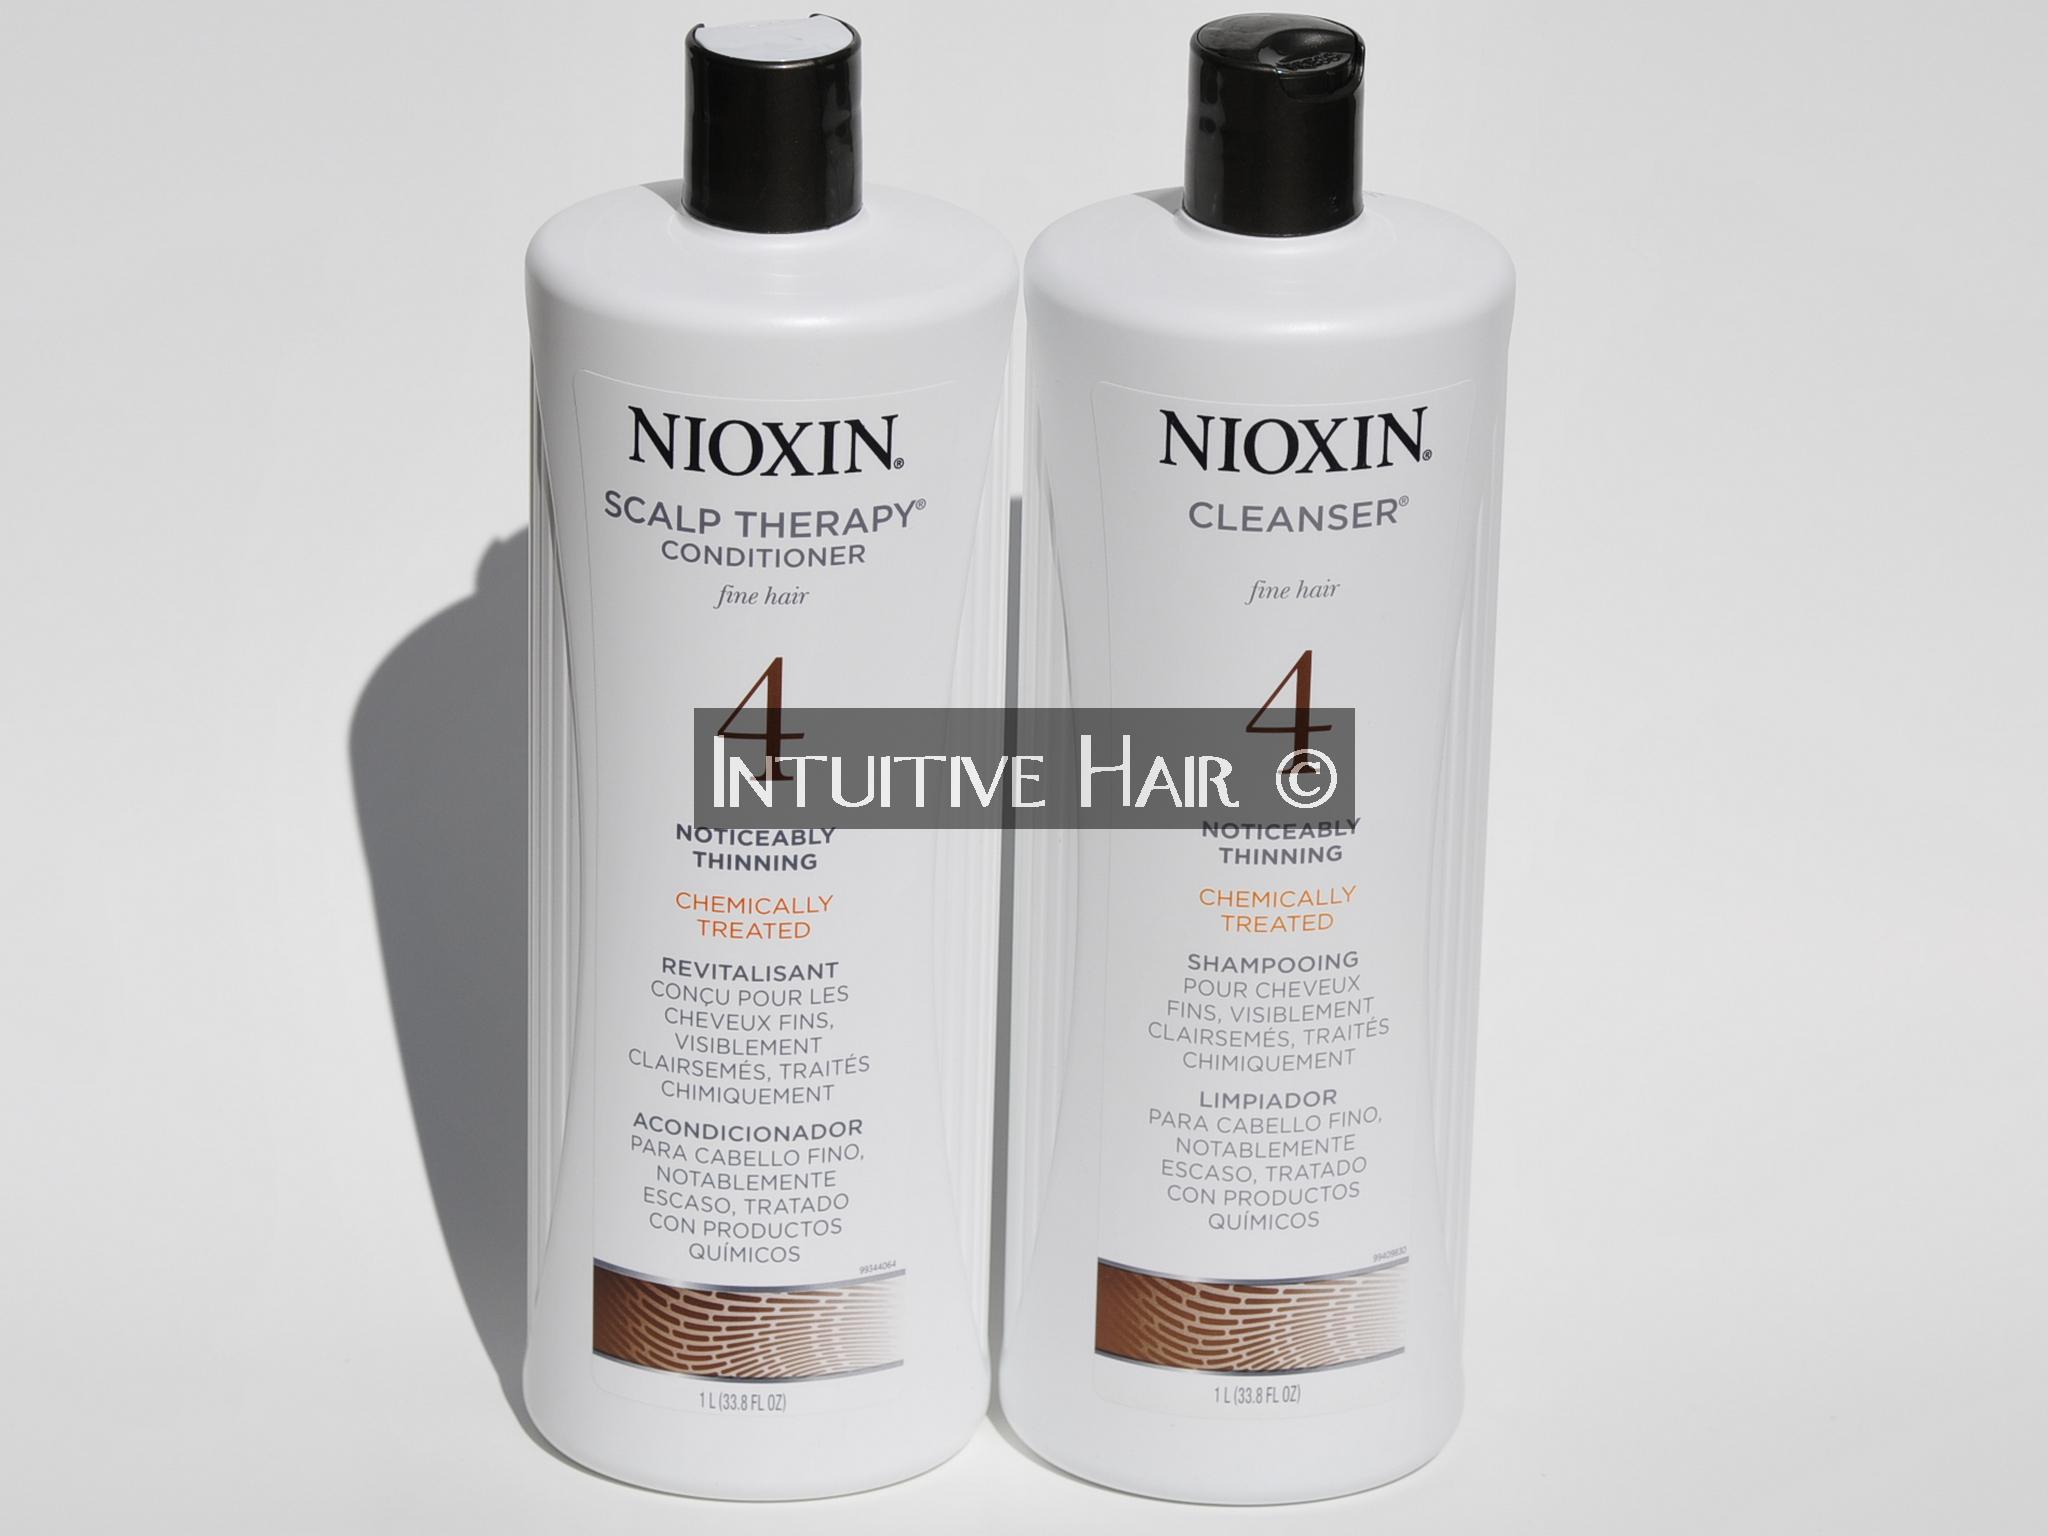 Nioxin Shampoo Conditioner On Shoppinder